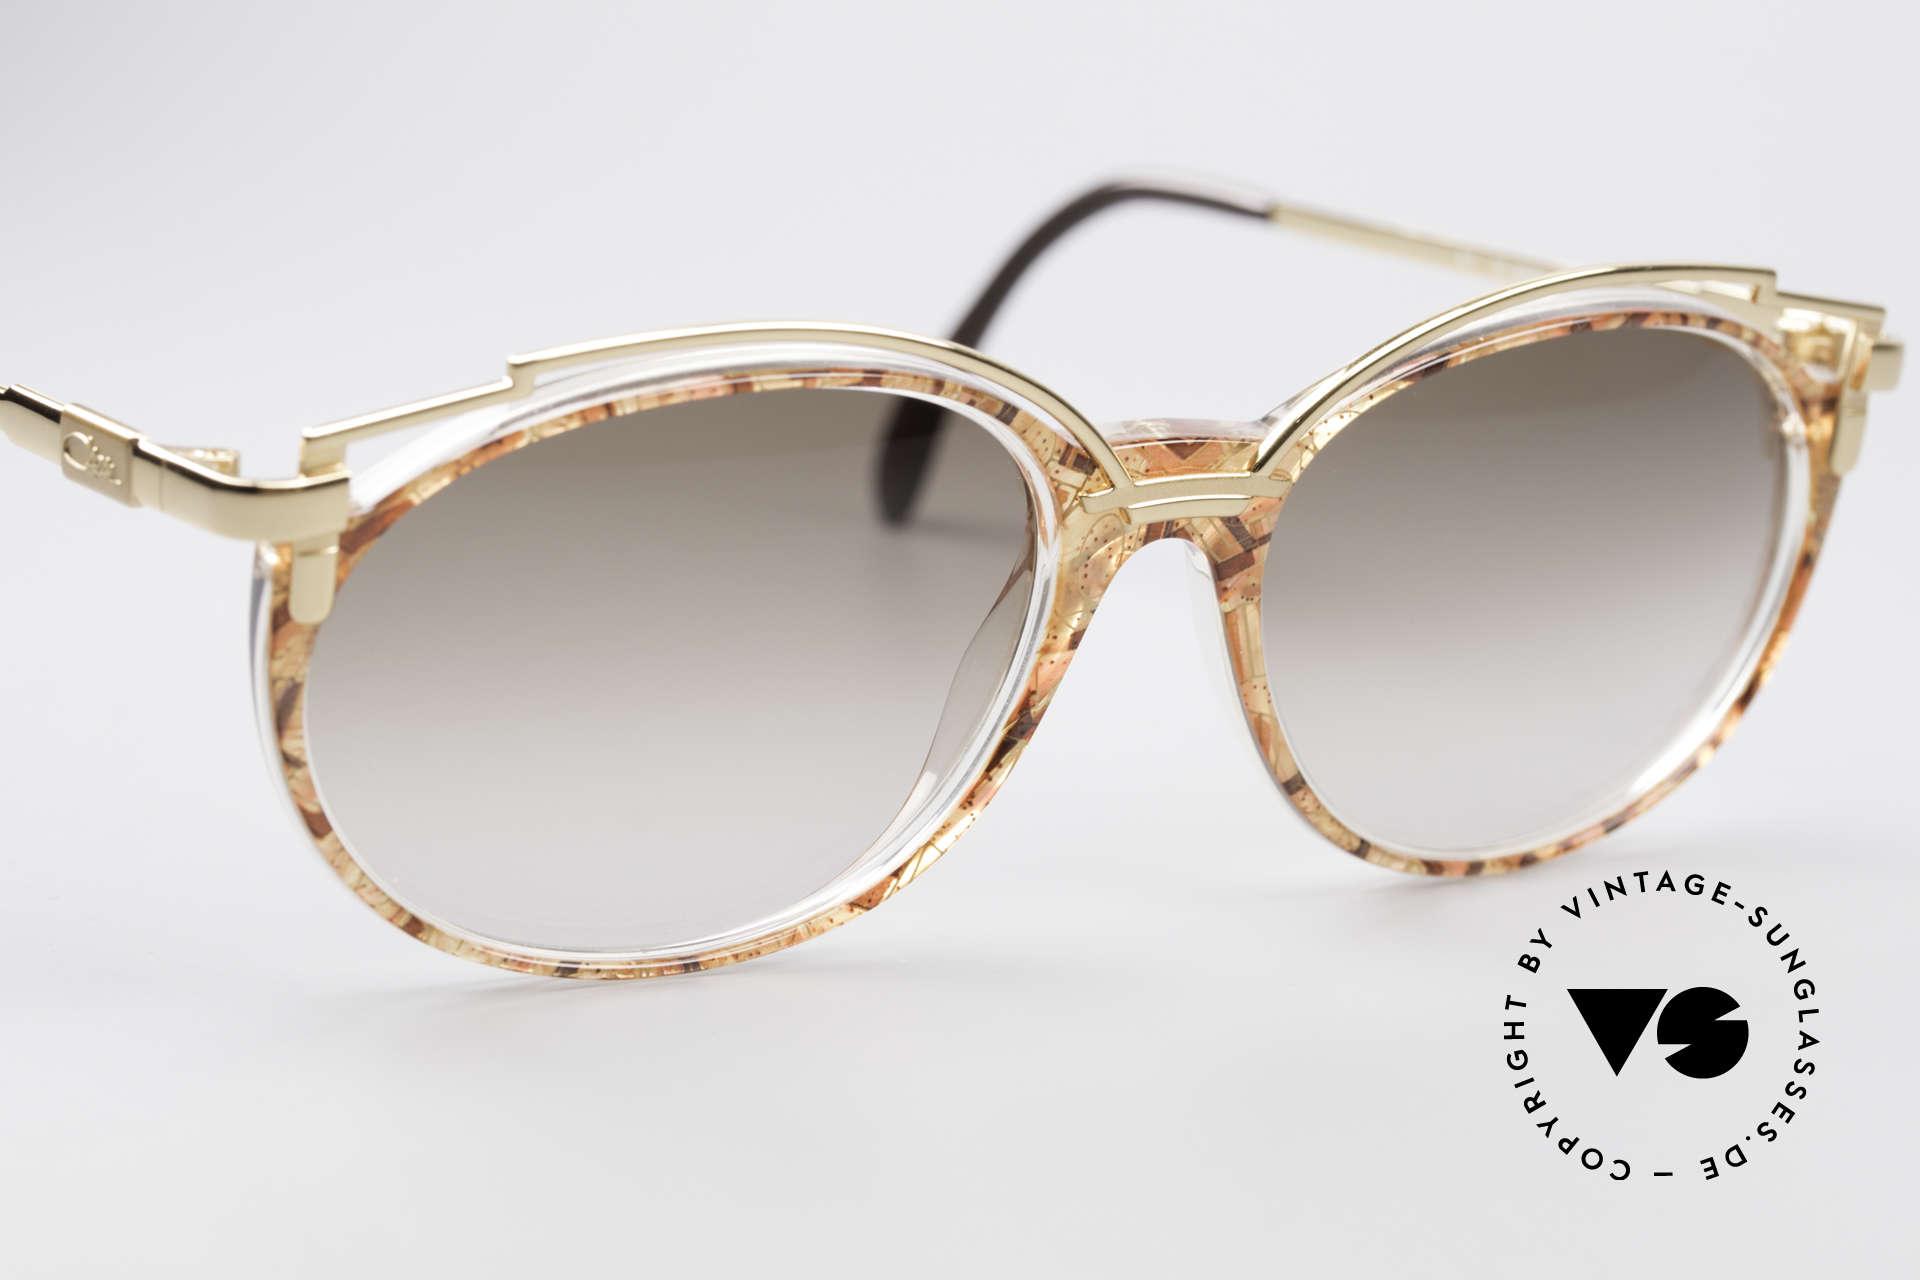 Cazal 358 90's Ladies Sunglasses Vintage, unworn, NOS (like all our rare VINTAGE Cazal eyewear), Made for Women